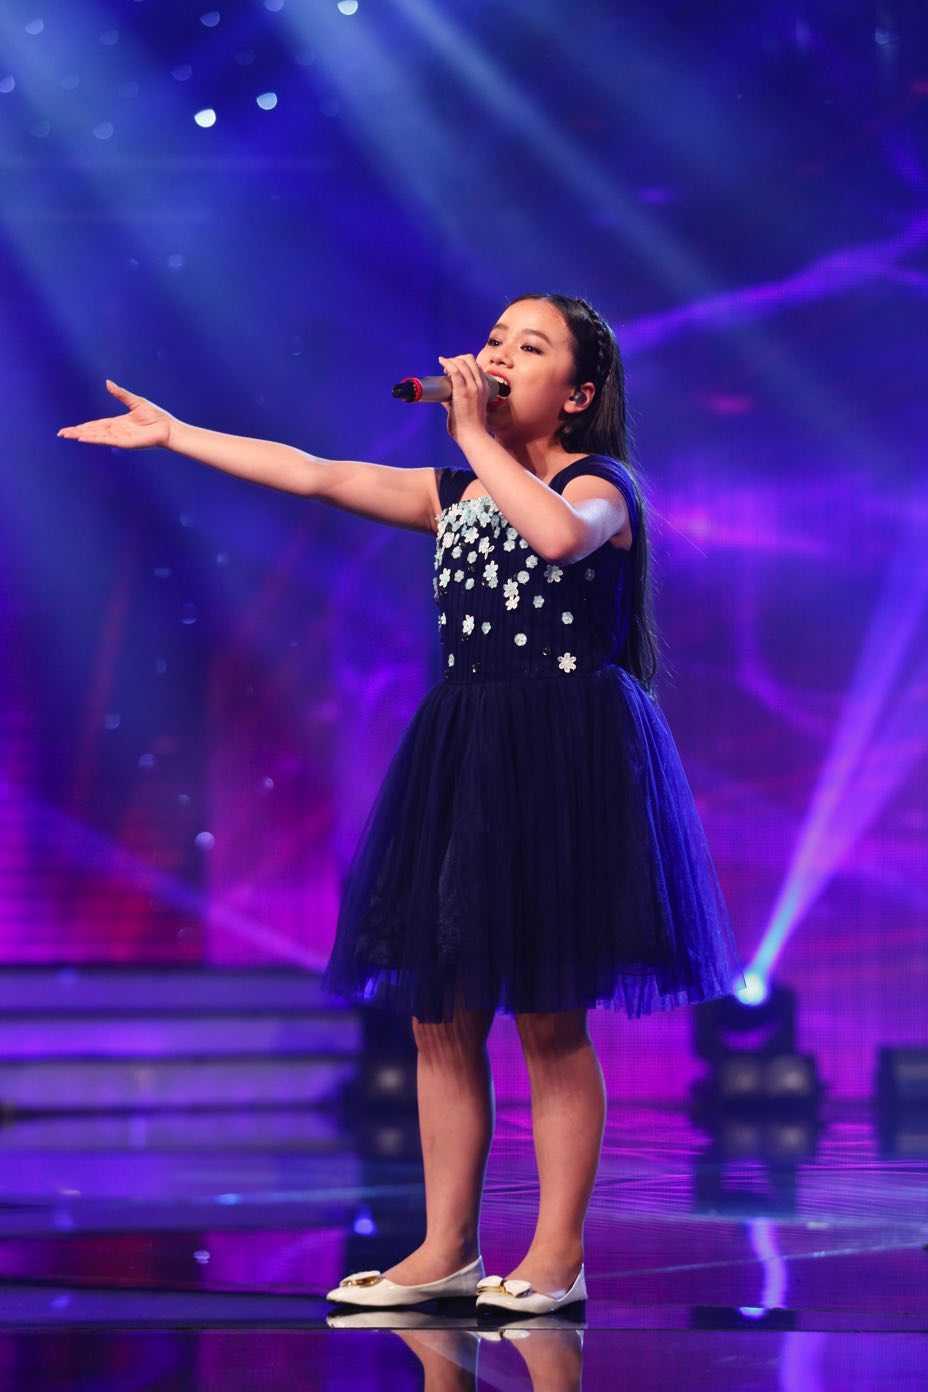 Truc tiep liveshow top 10 Vietnam Idol Kids: 10 'thien than nho' da san sang hinh anh 13